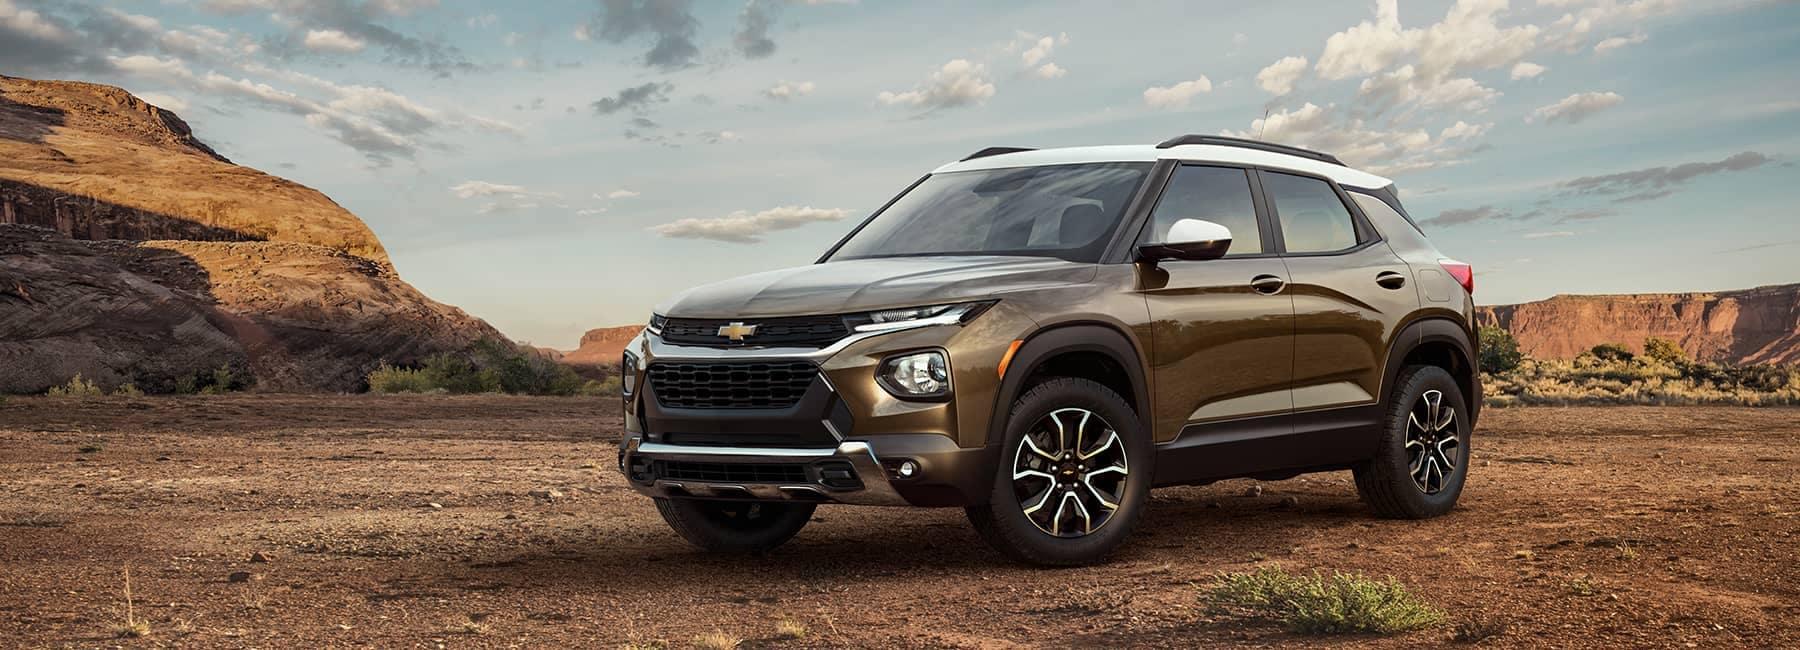 2021 Chevrolet Trailblazer on a Dirt Rd